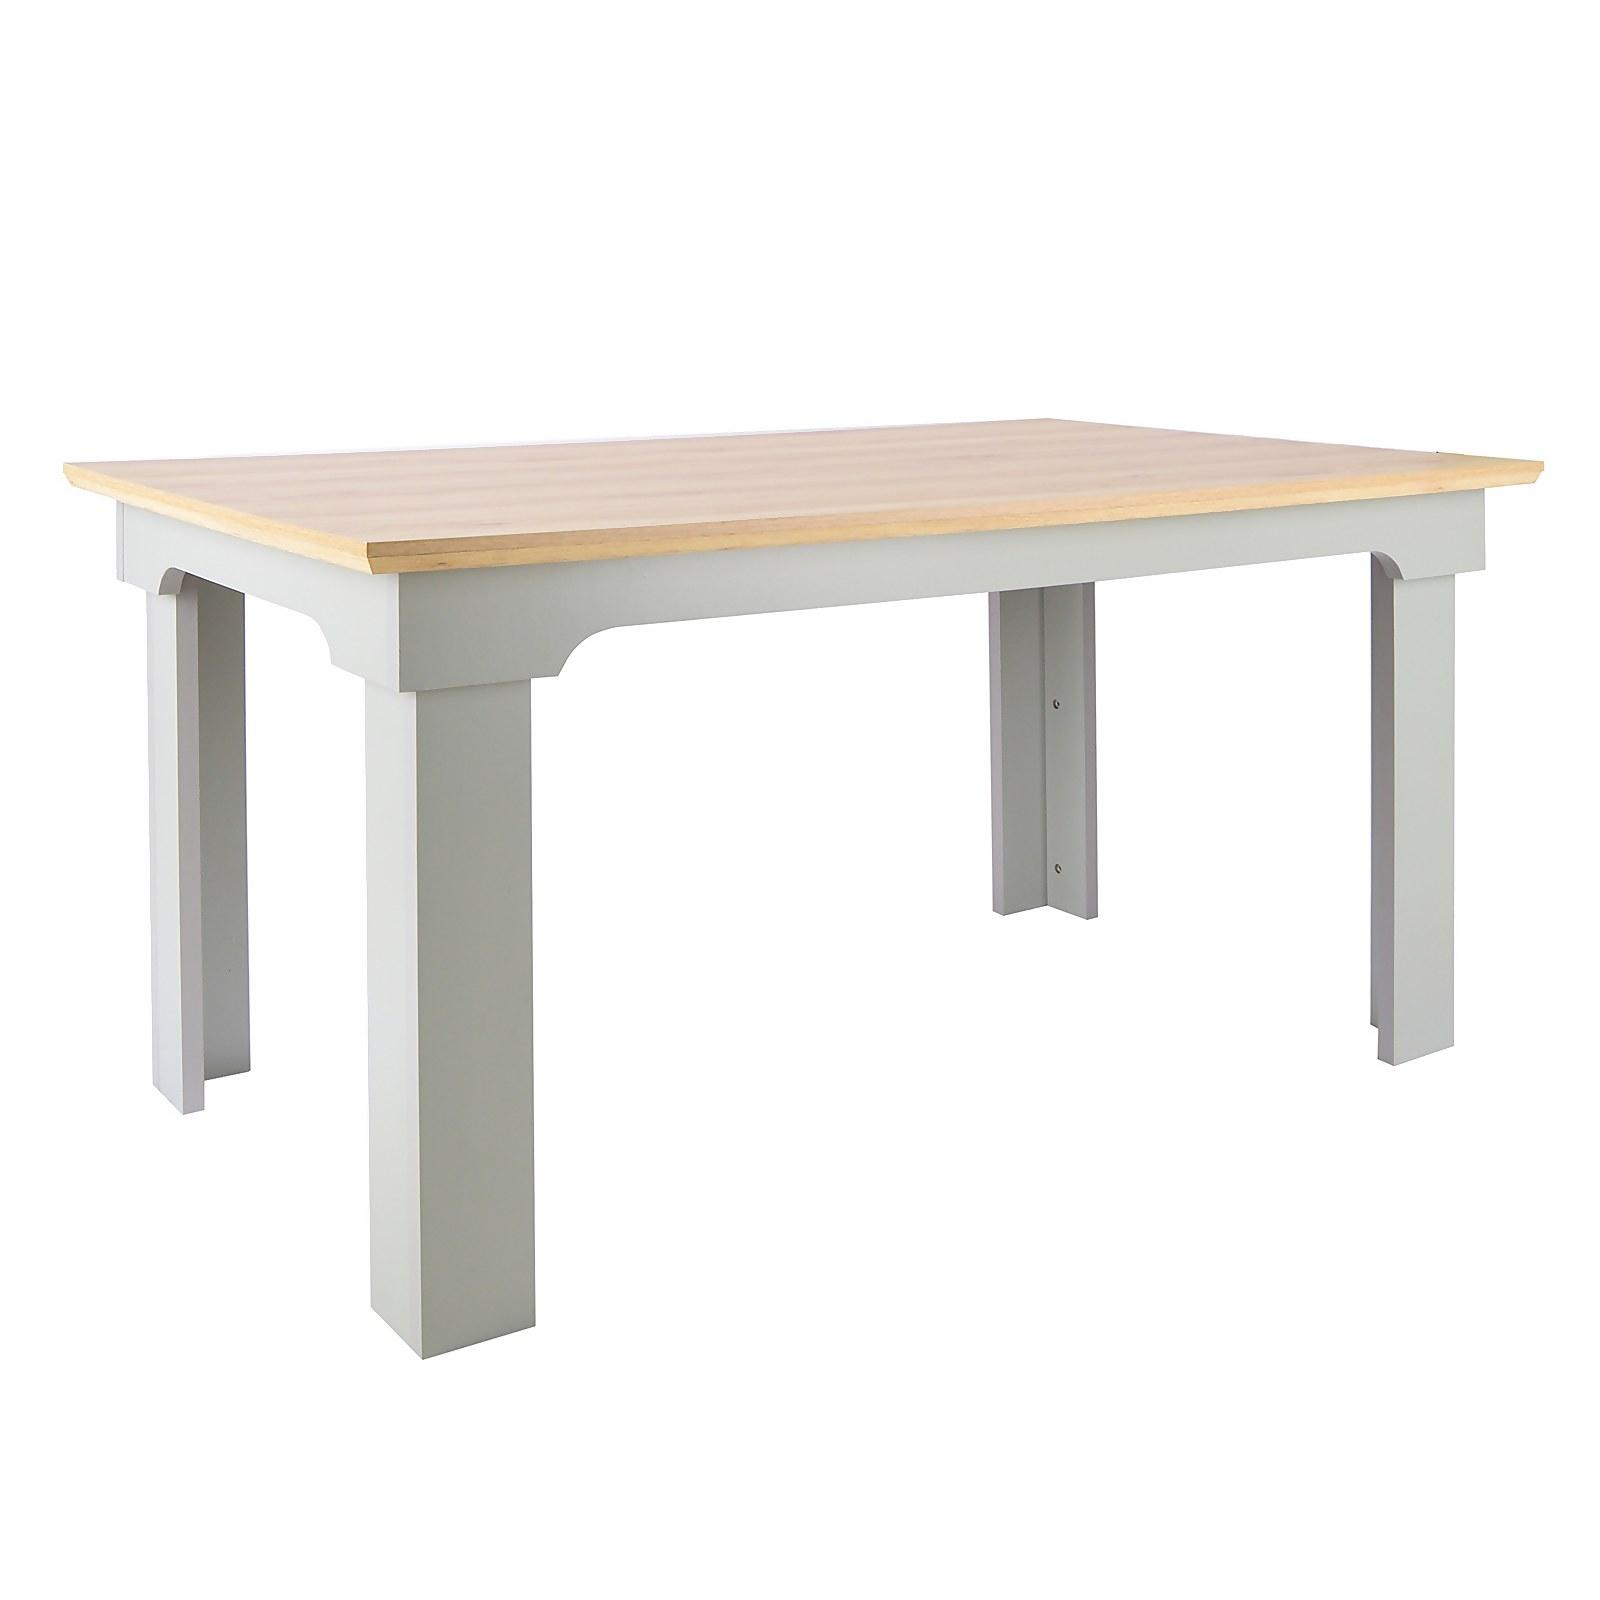 Diva Dining Table - Grey